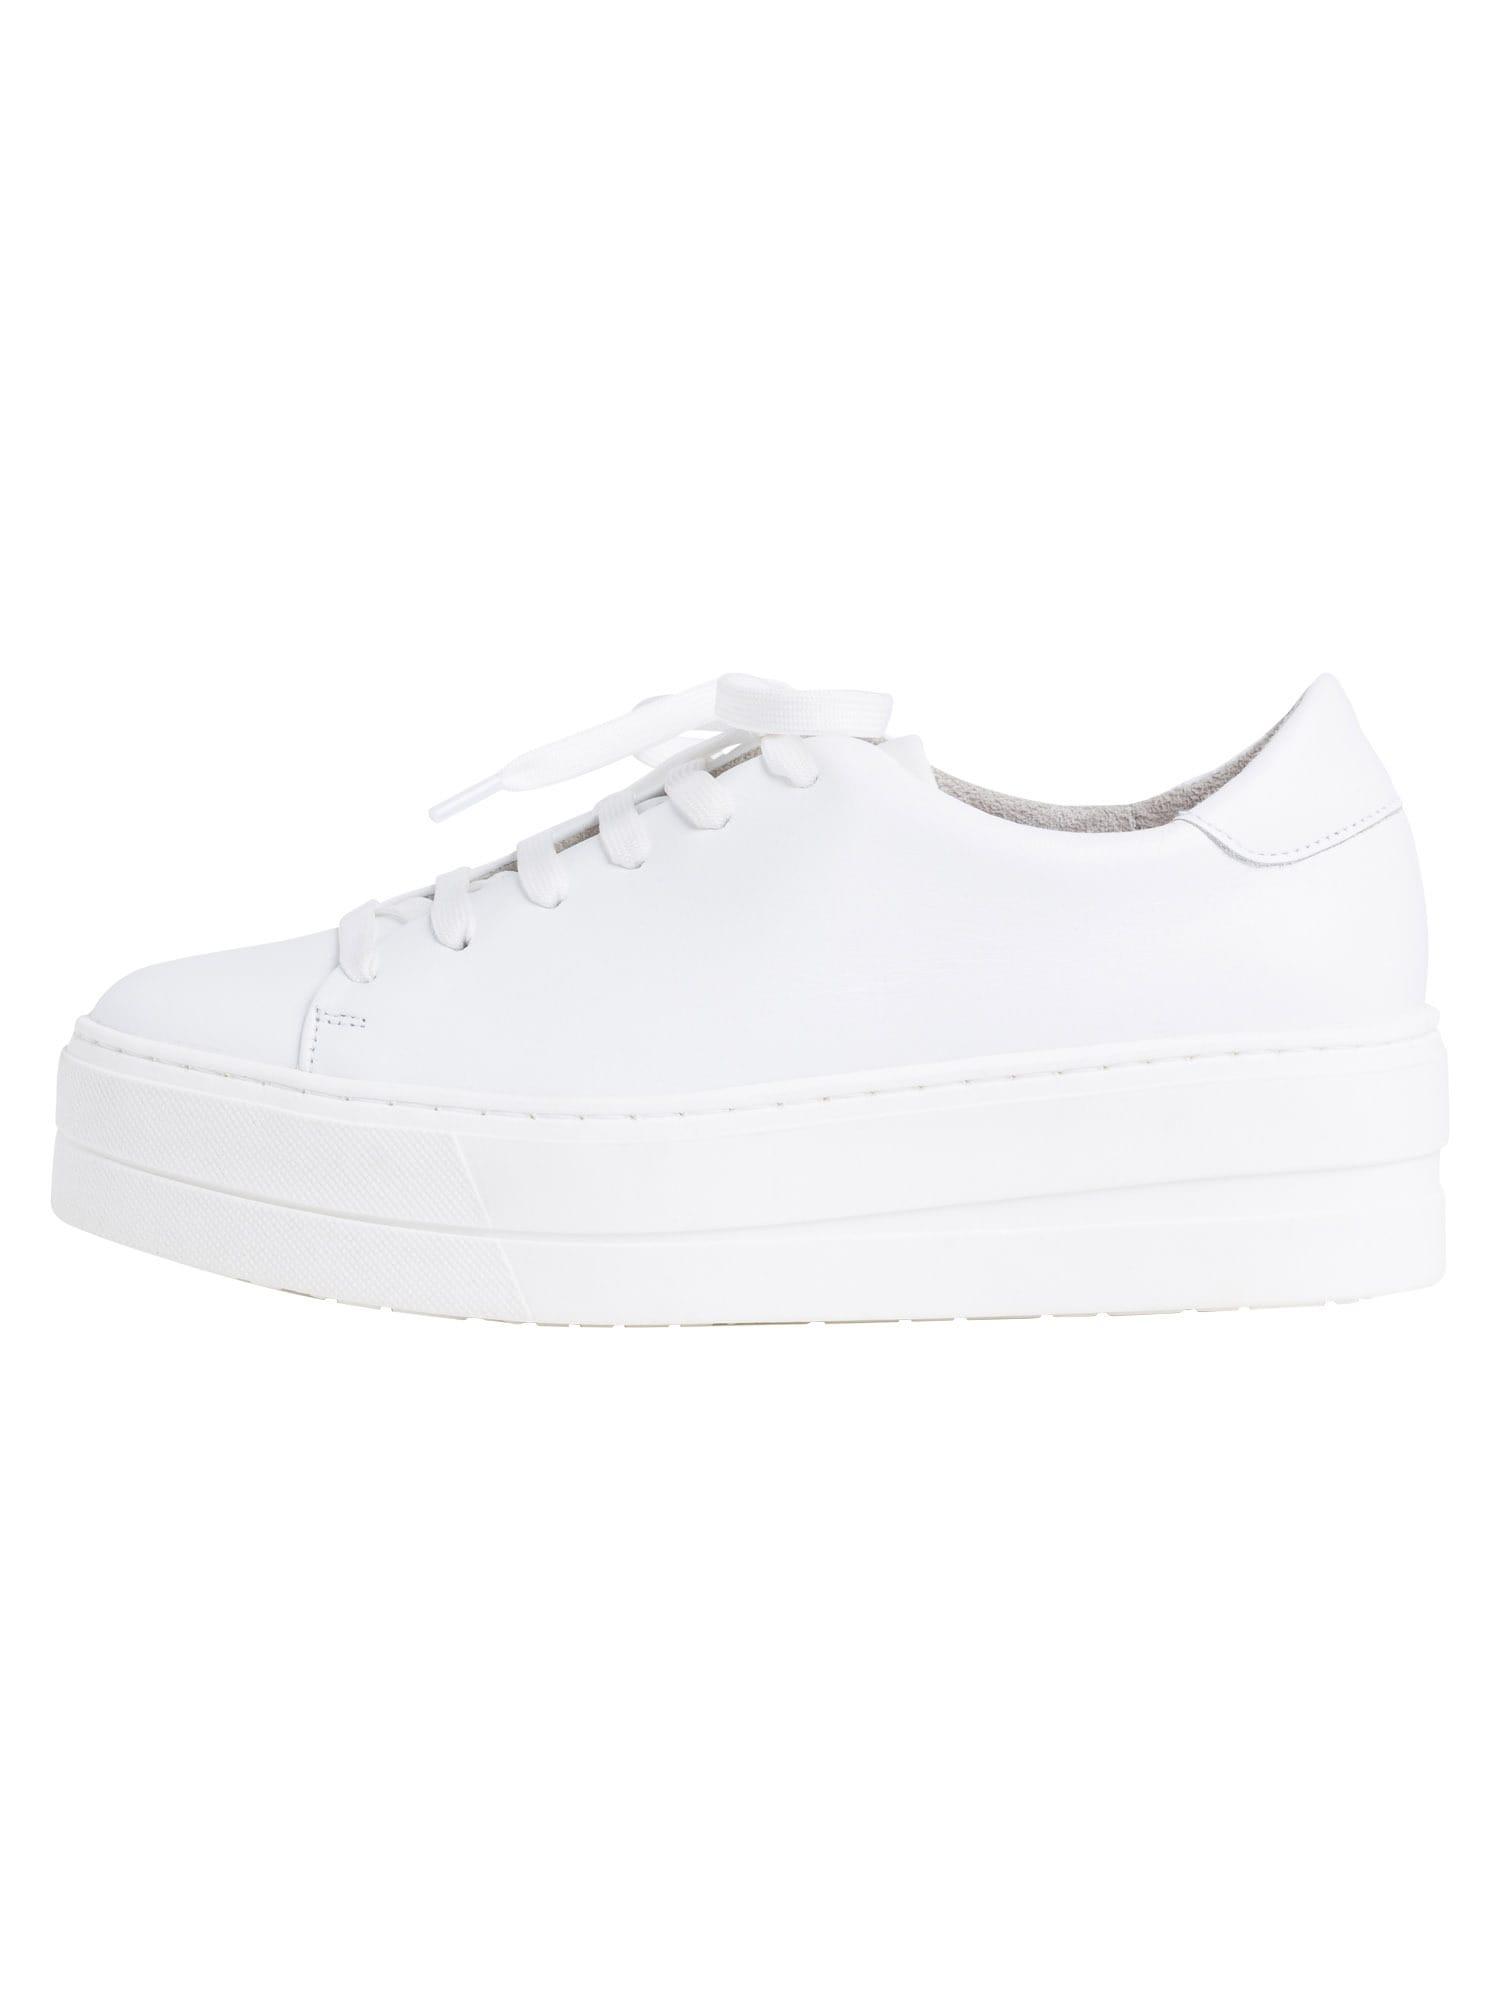 TAMARIS Baskets basses  - Blanc - Taille: 39 - female